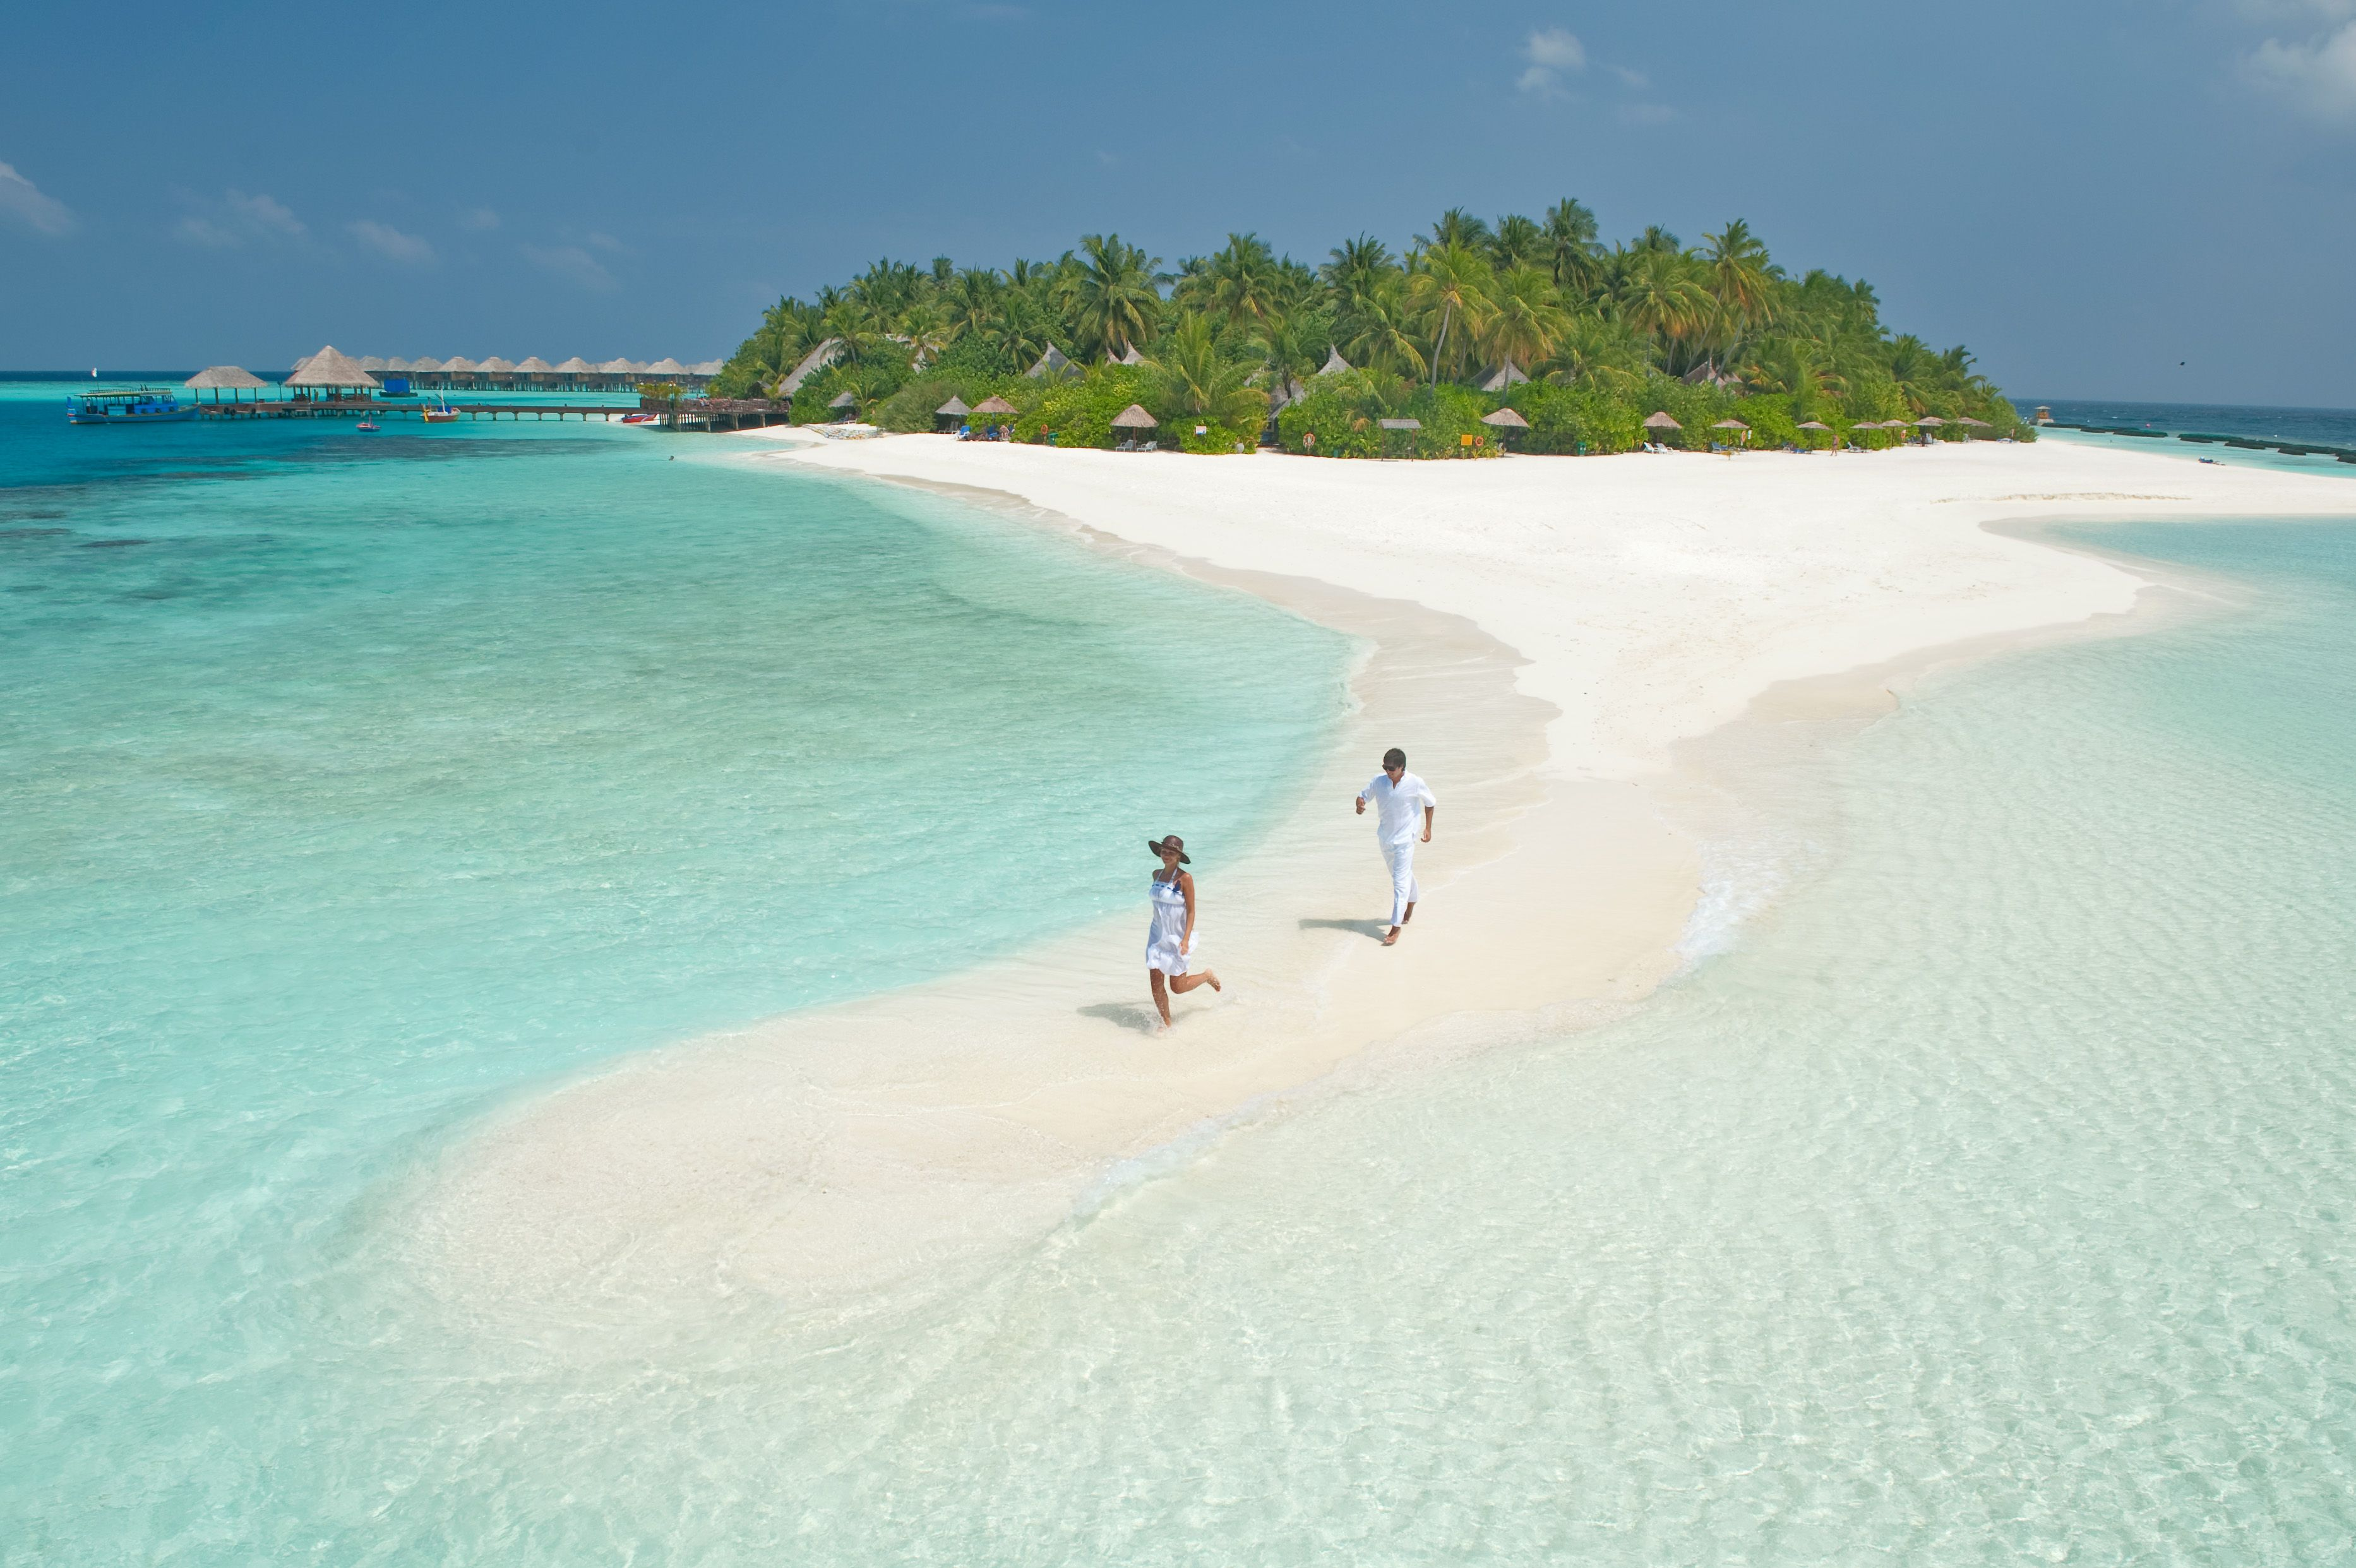 Beautiful holiday at Vilu Reef Island Maldives --->>> www.voyagewave.com